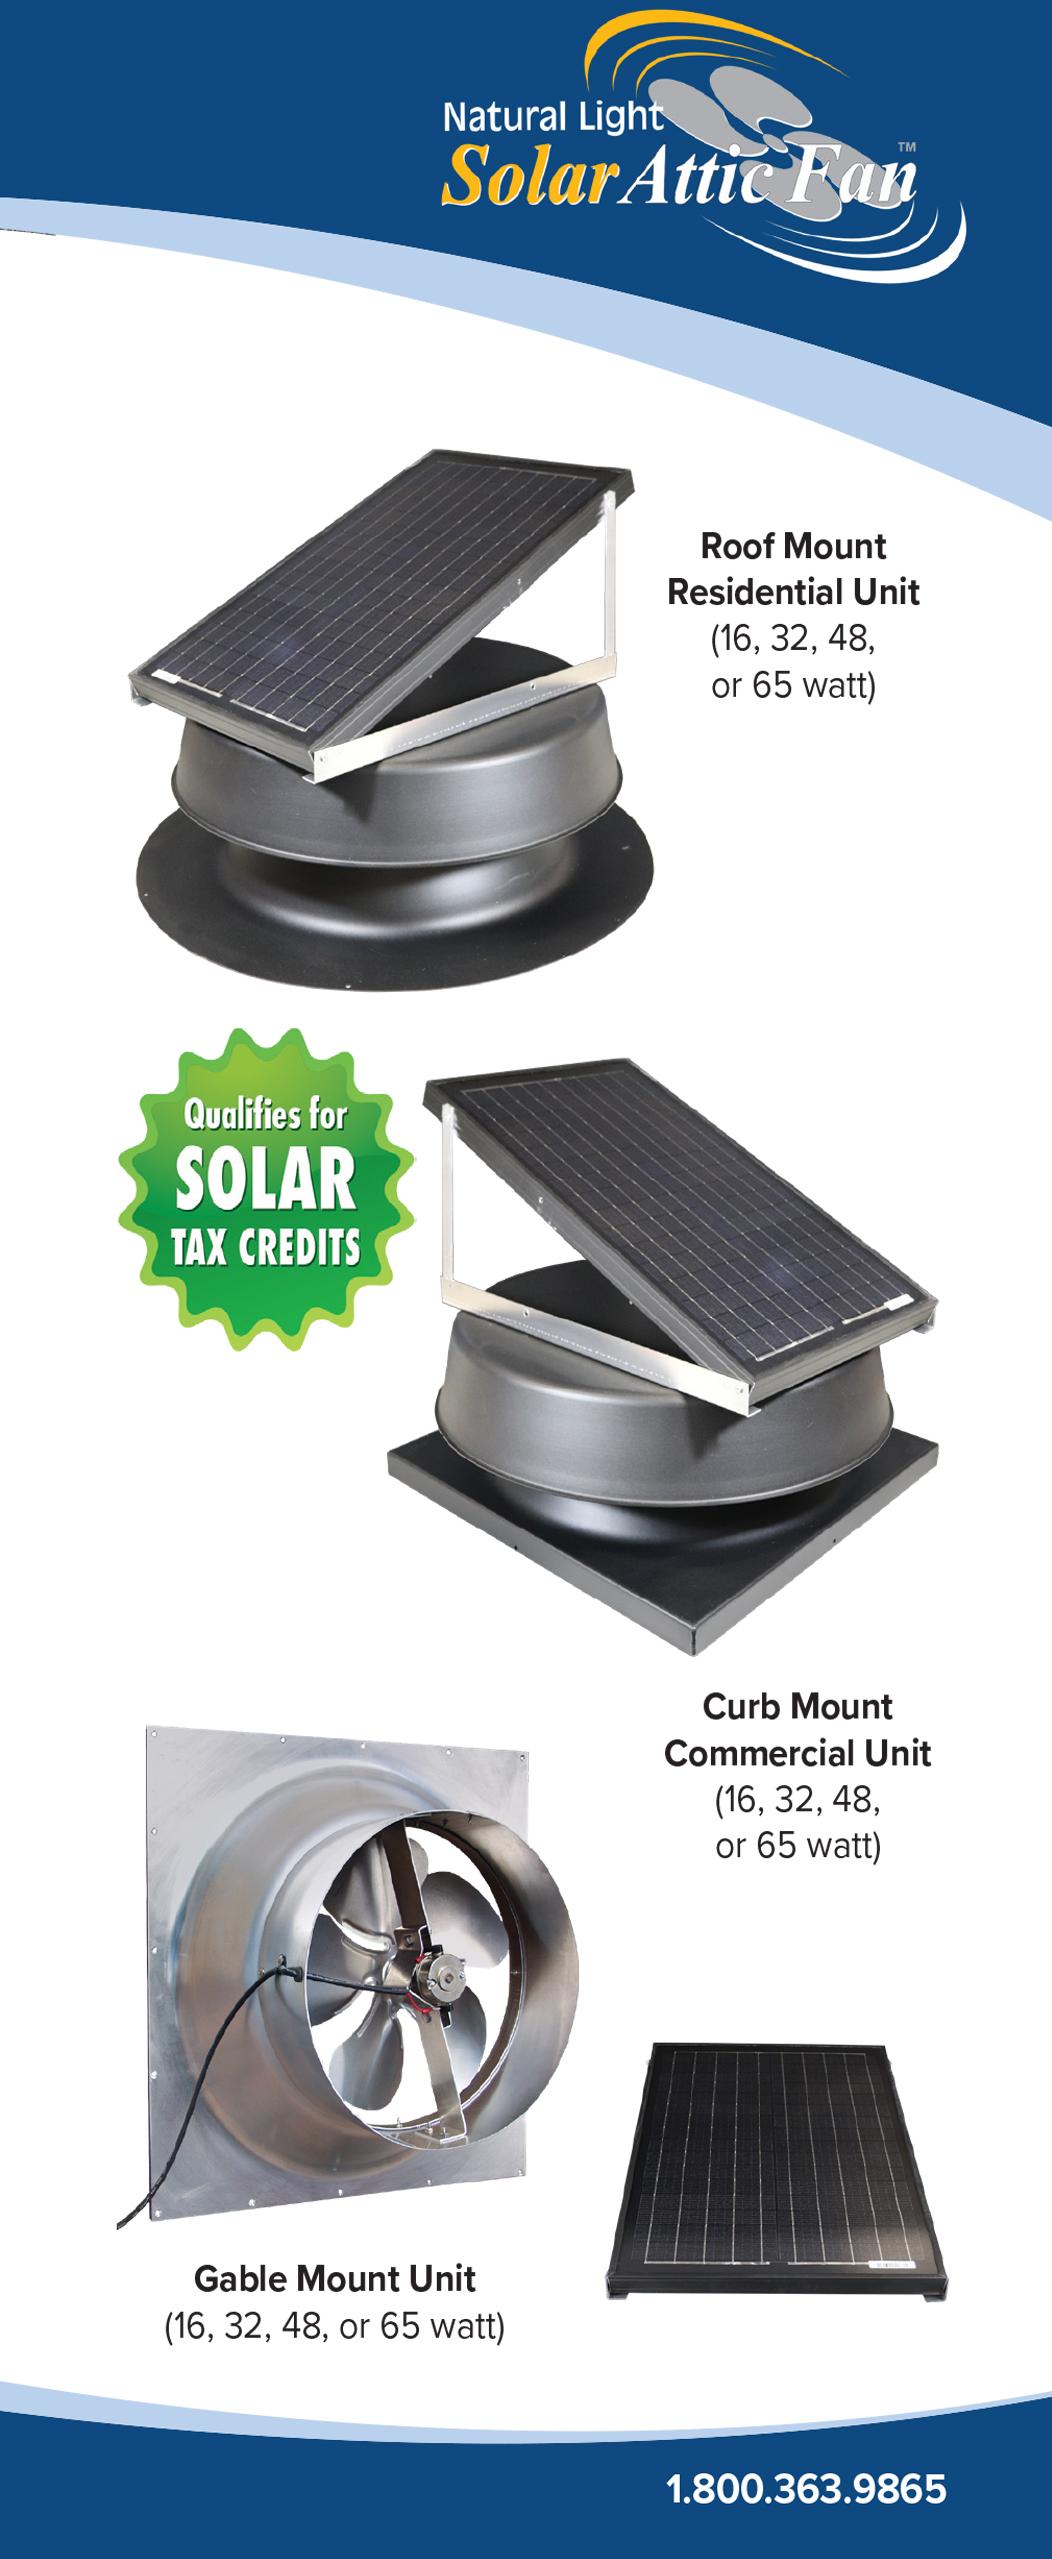 https://www.solaratticfan.com/wp-content/uploads/2021/03/SAF_NLESbrochure_icon.jpg